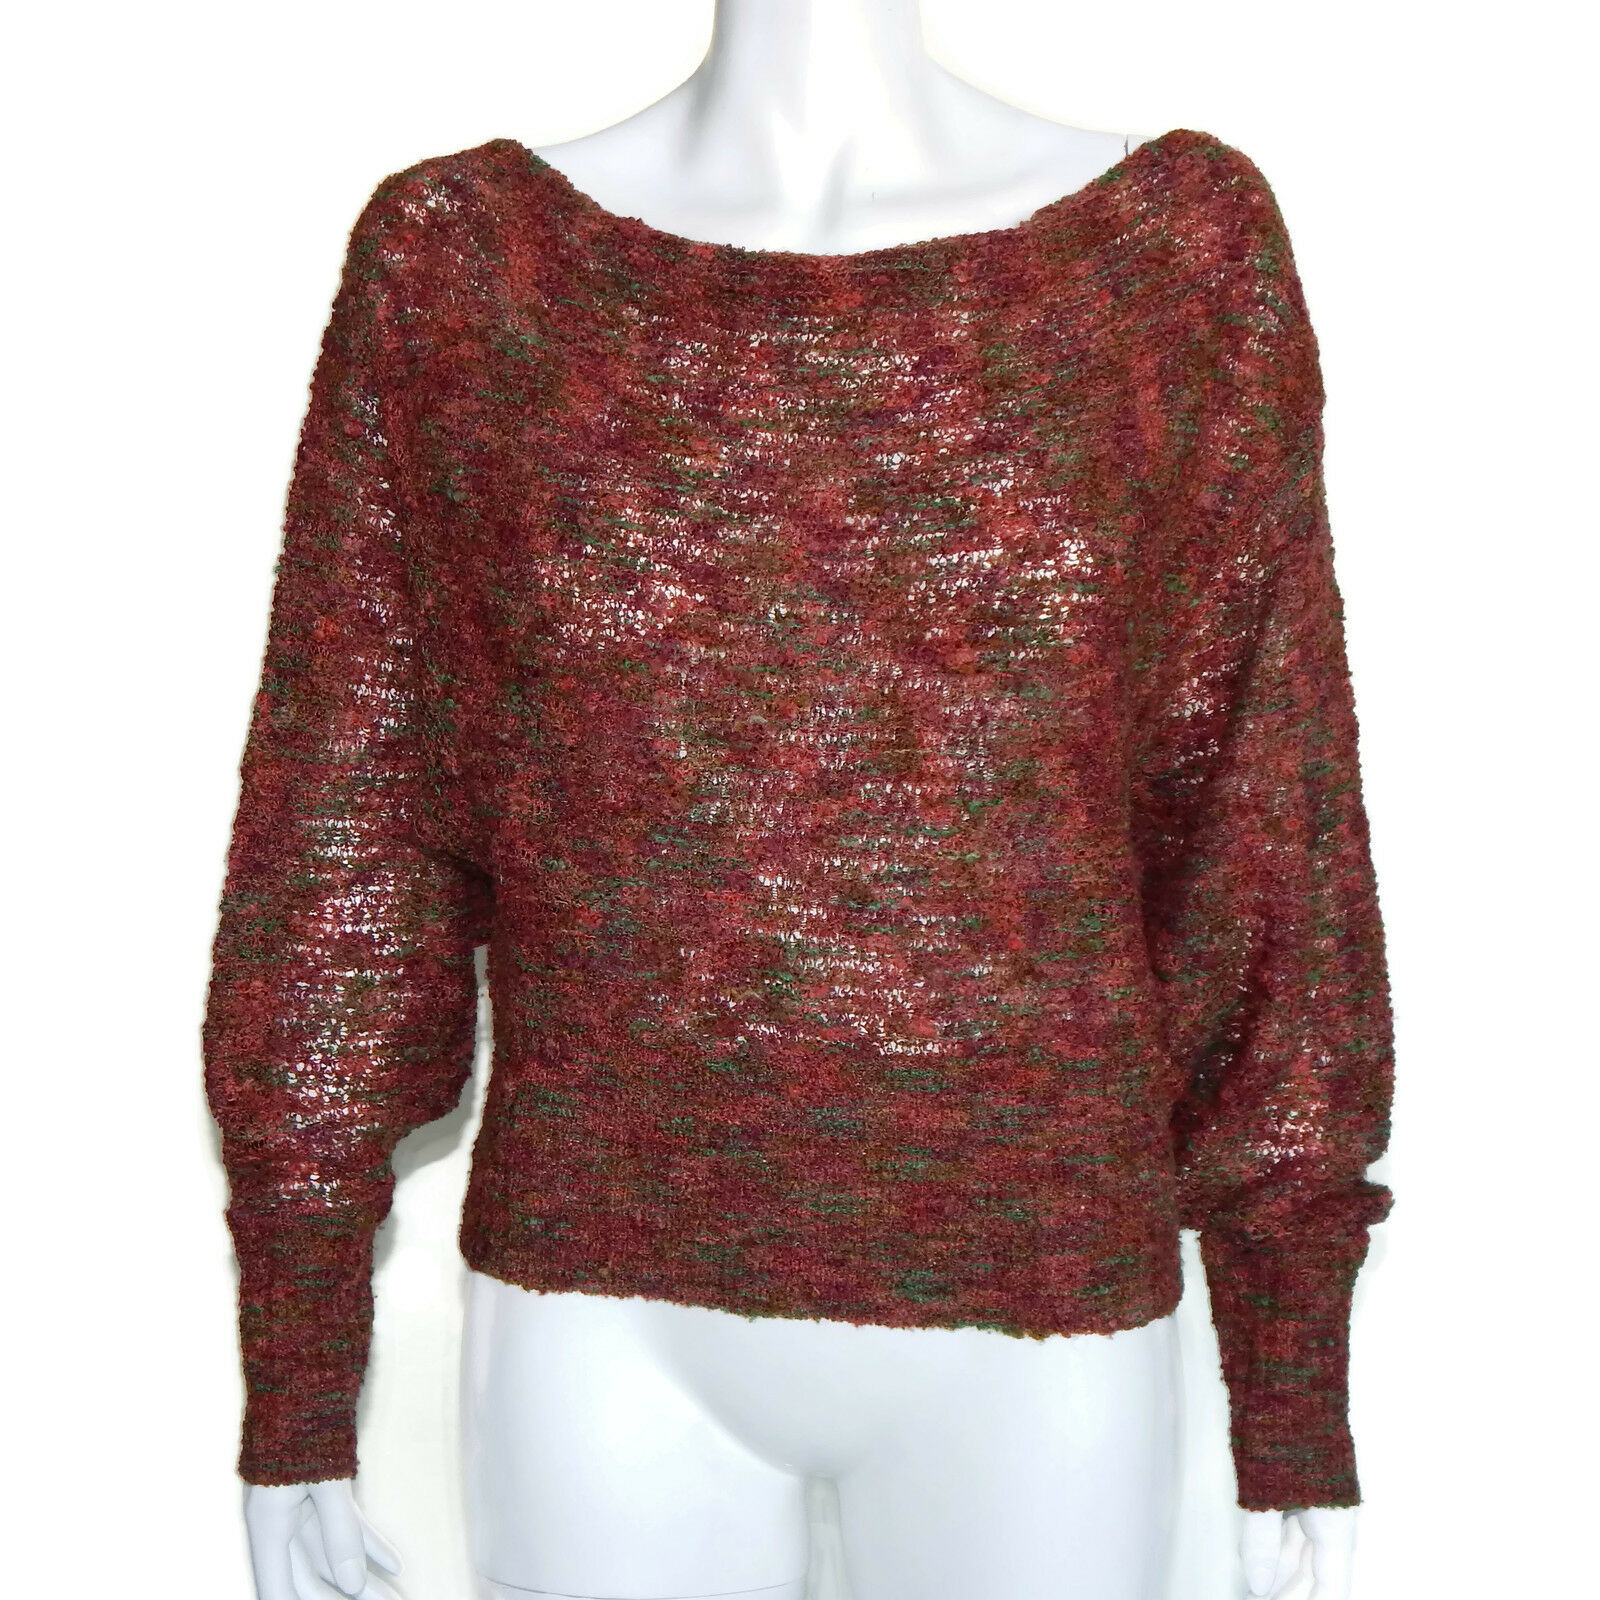 DIANE VON FURSTENBERG Multi-color Semi Sheer Wooly Wooly Wooly Textured Sweater M  4556 c6ecc9